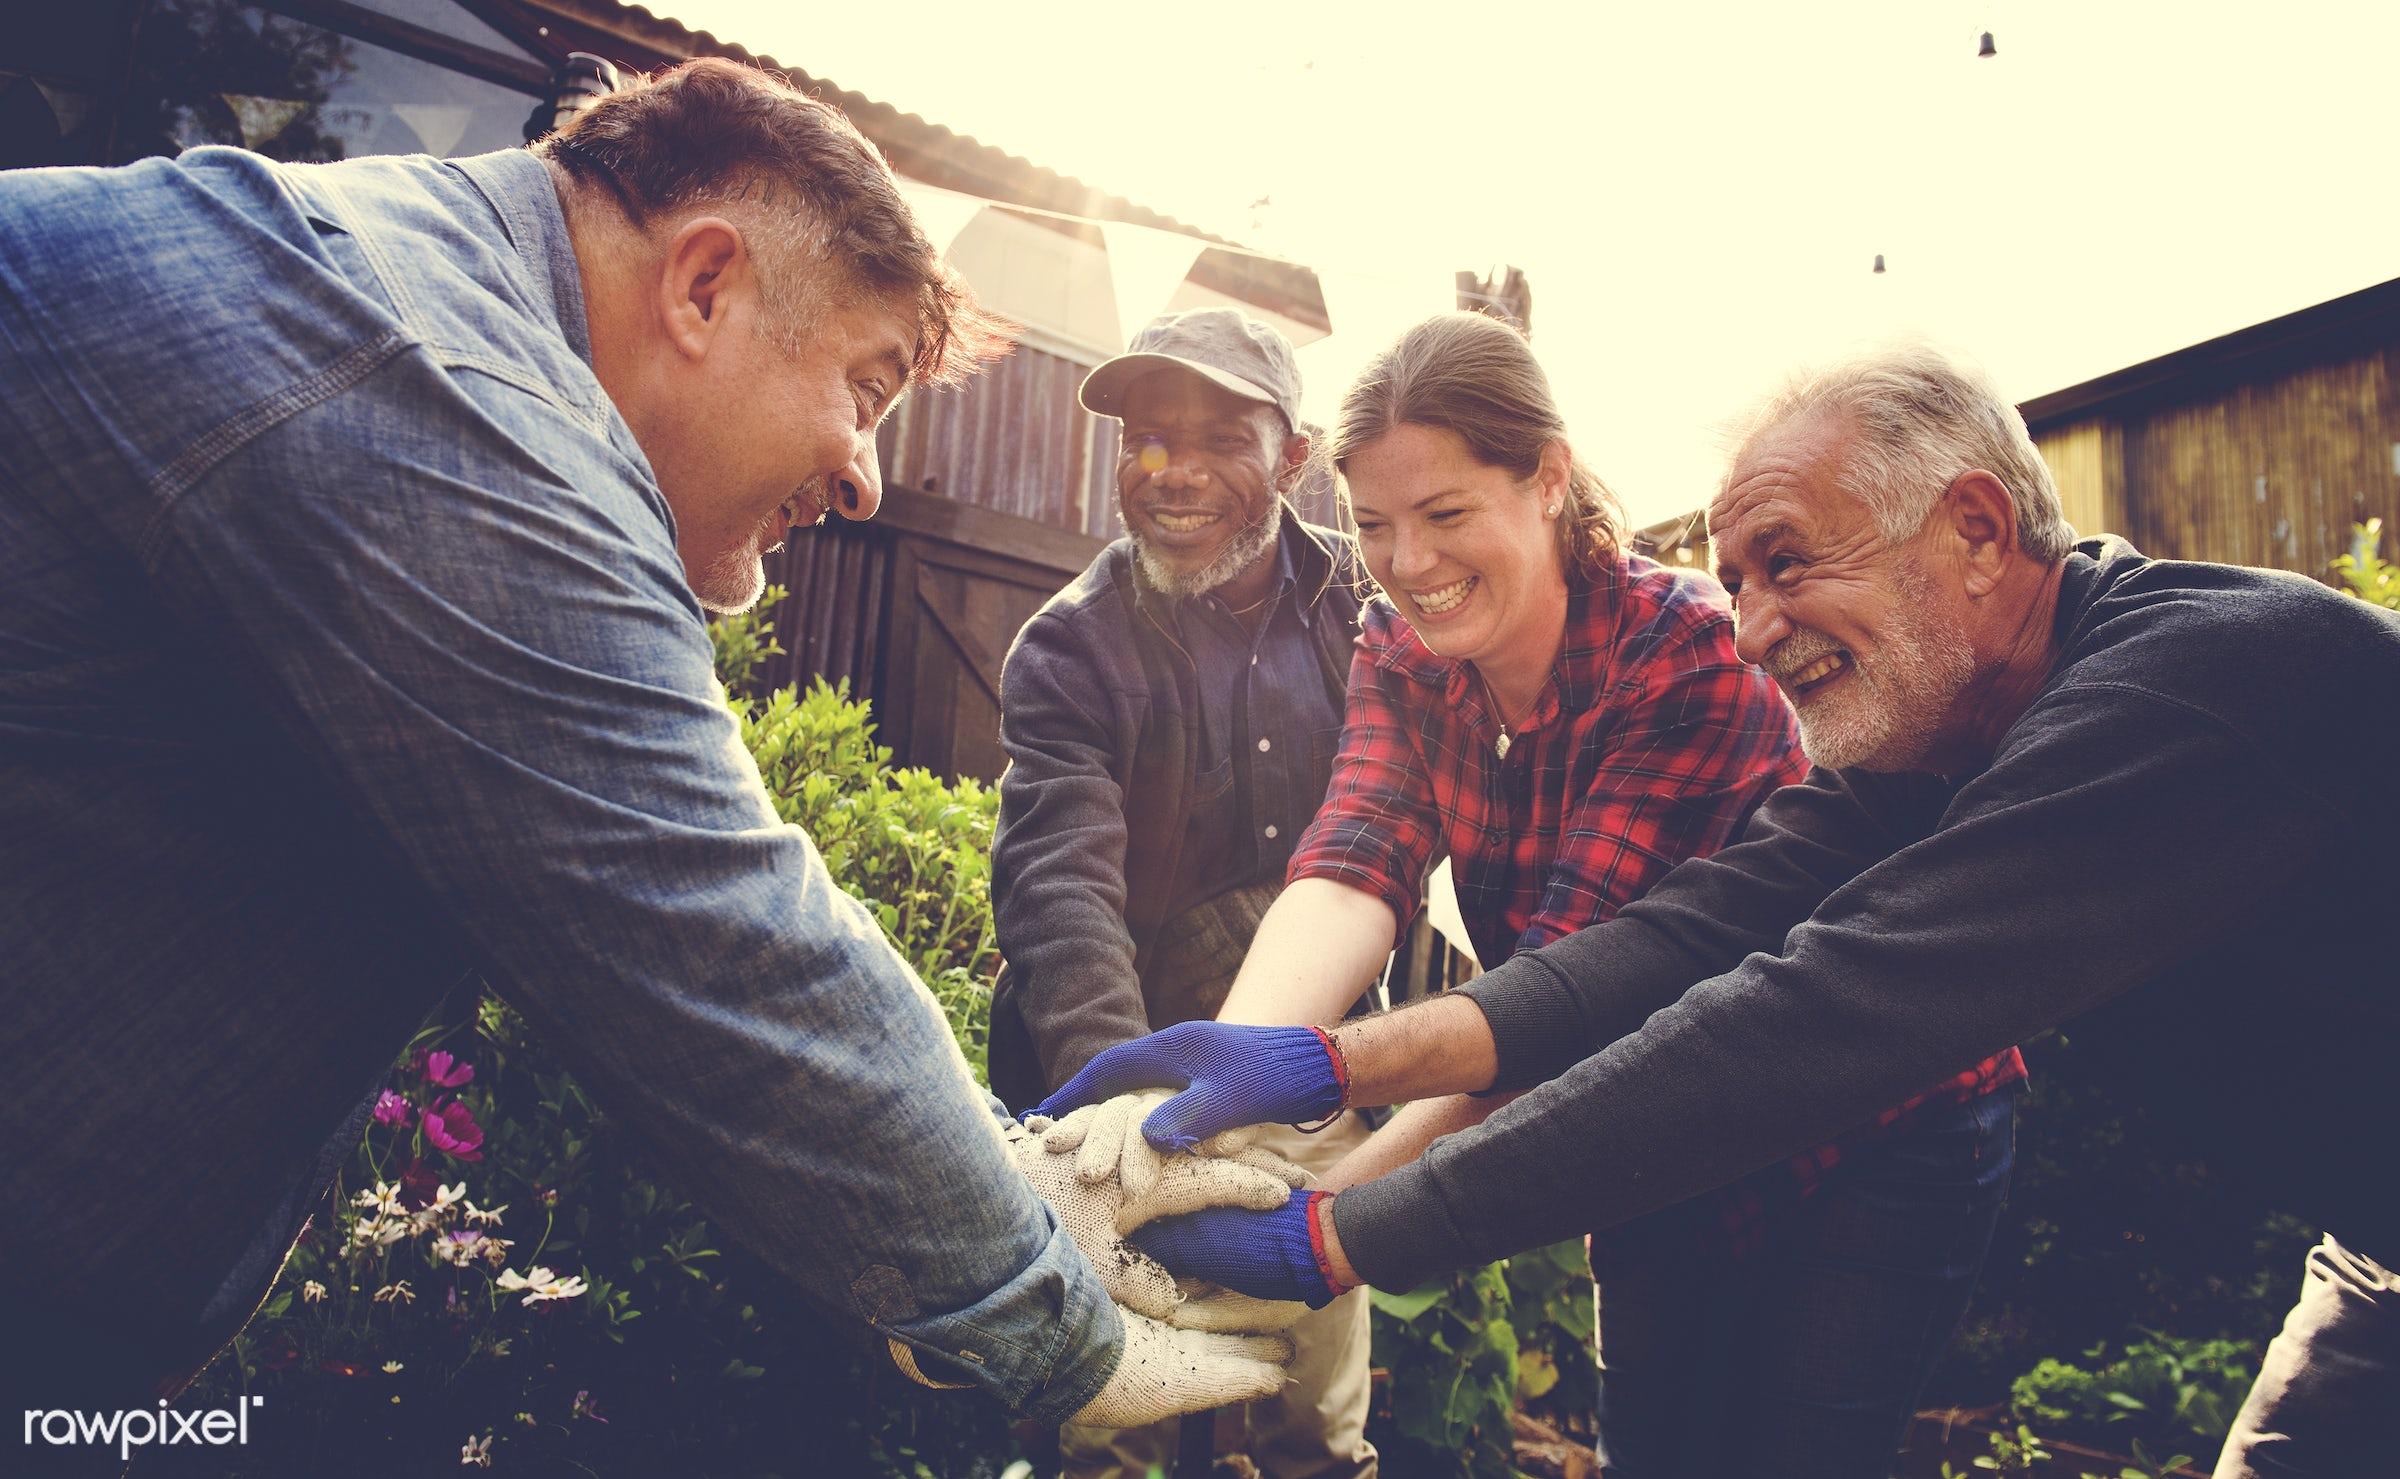 plant, nutritious, friends, farmer, fresh, lettuce, healthy eating, friendship, men, flower, diversity, support, green,...